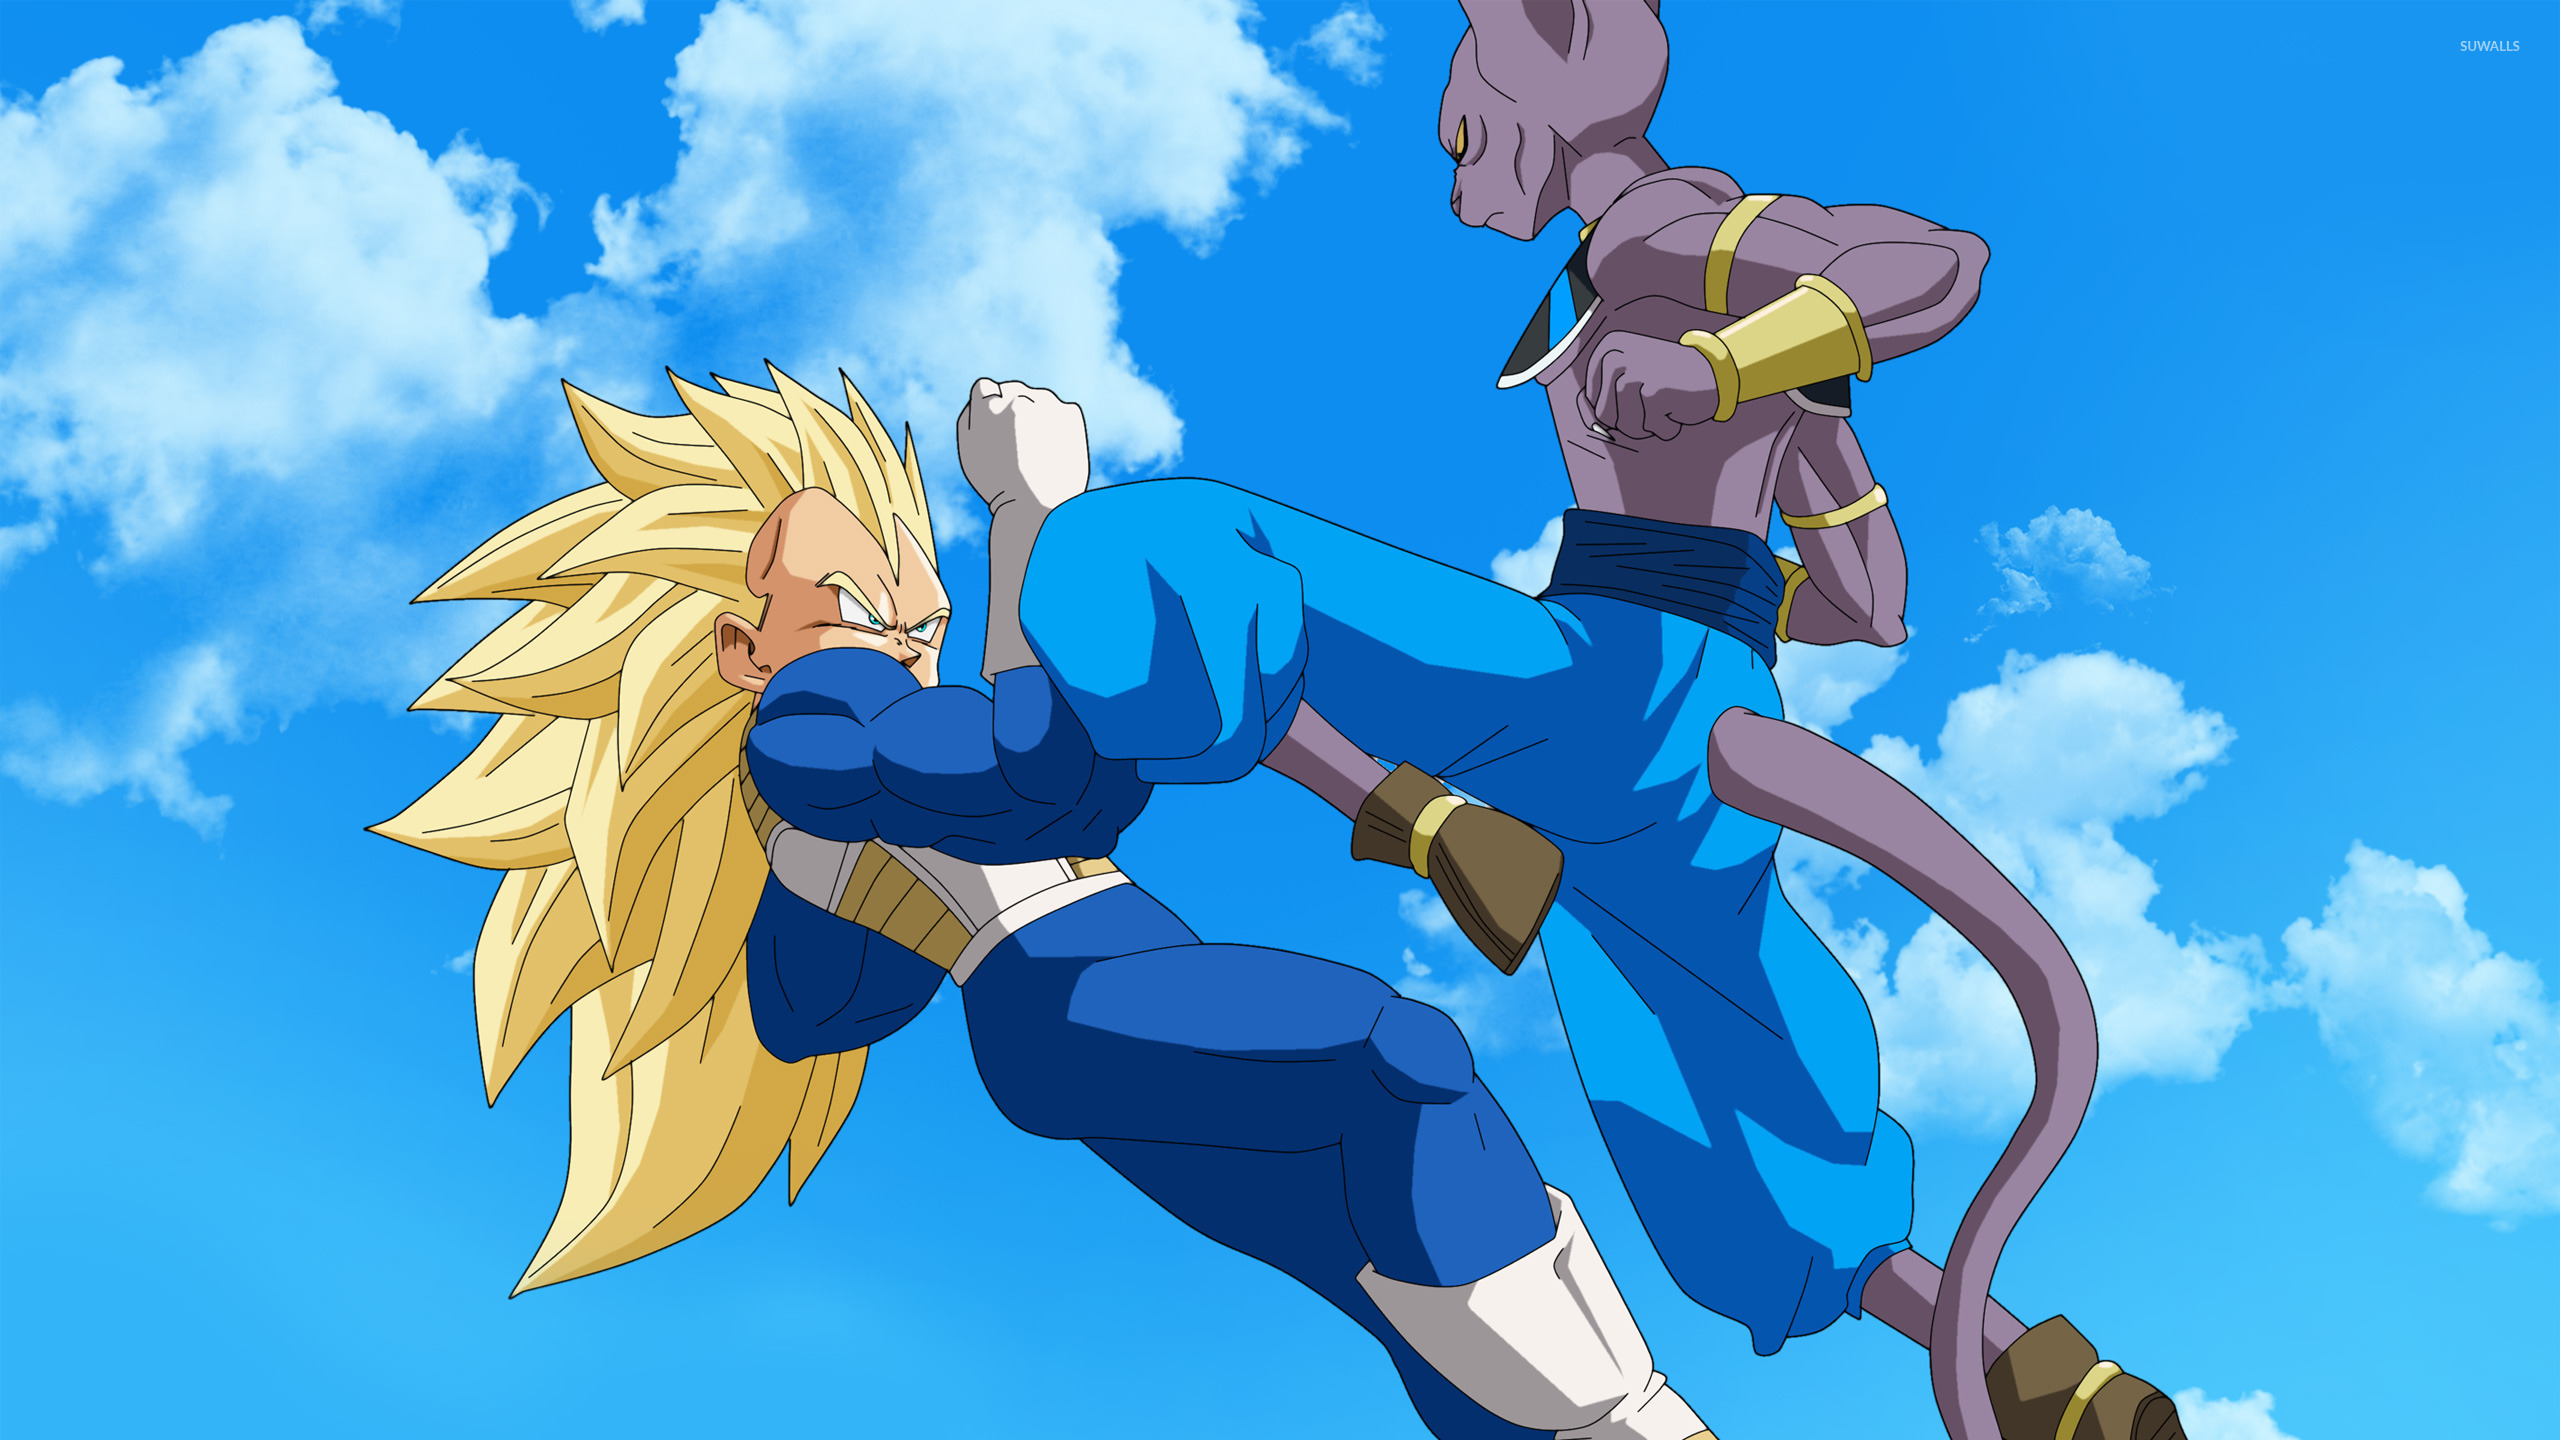 Bills and Vegeta - Dragon Ball Z Battle of Gods wallpaper 2560x1440 jpg